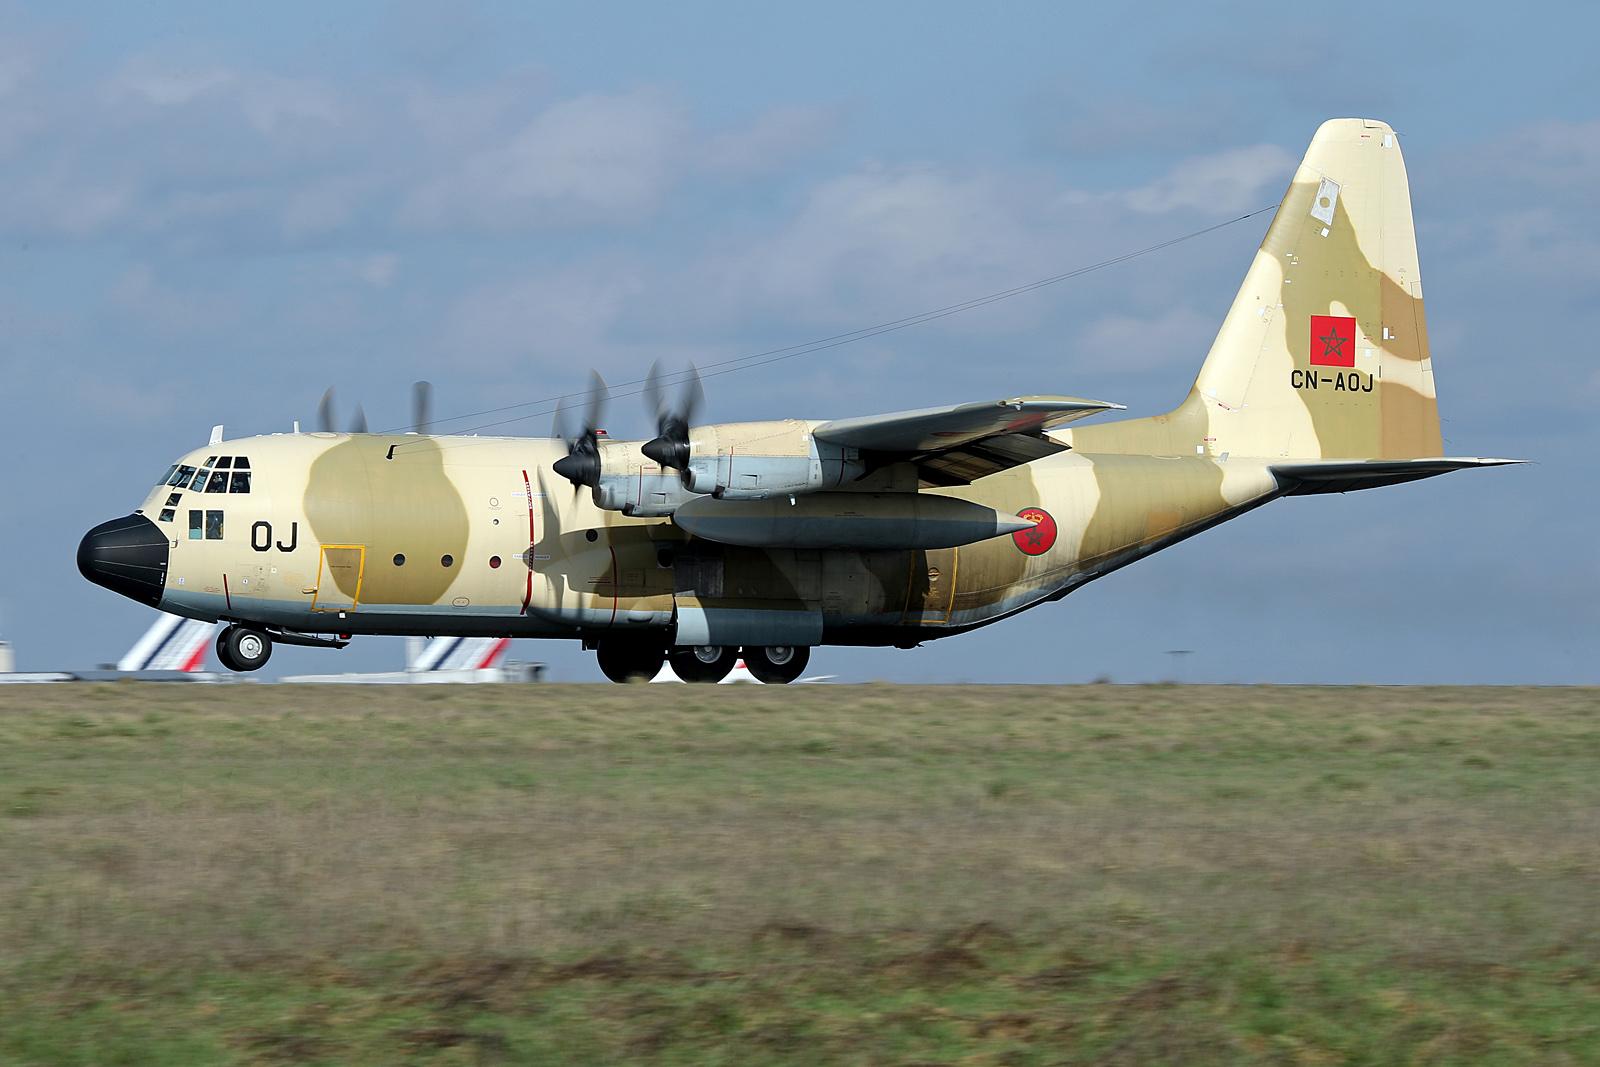 FRA: Photos d'avions de transport - Page 42 50973165871_25981afe27_o_d